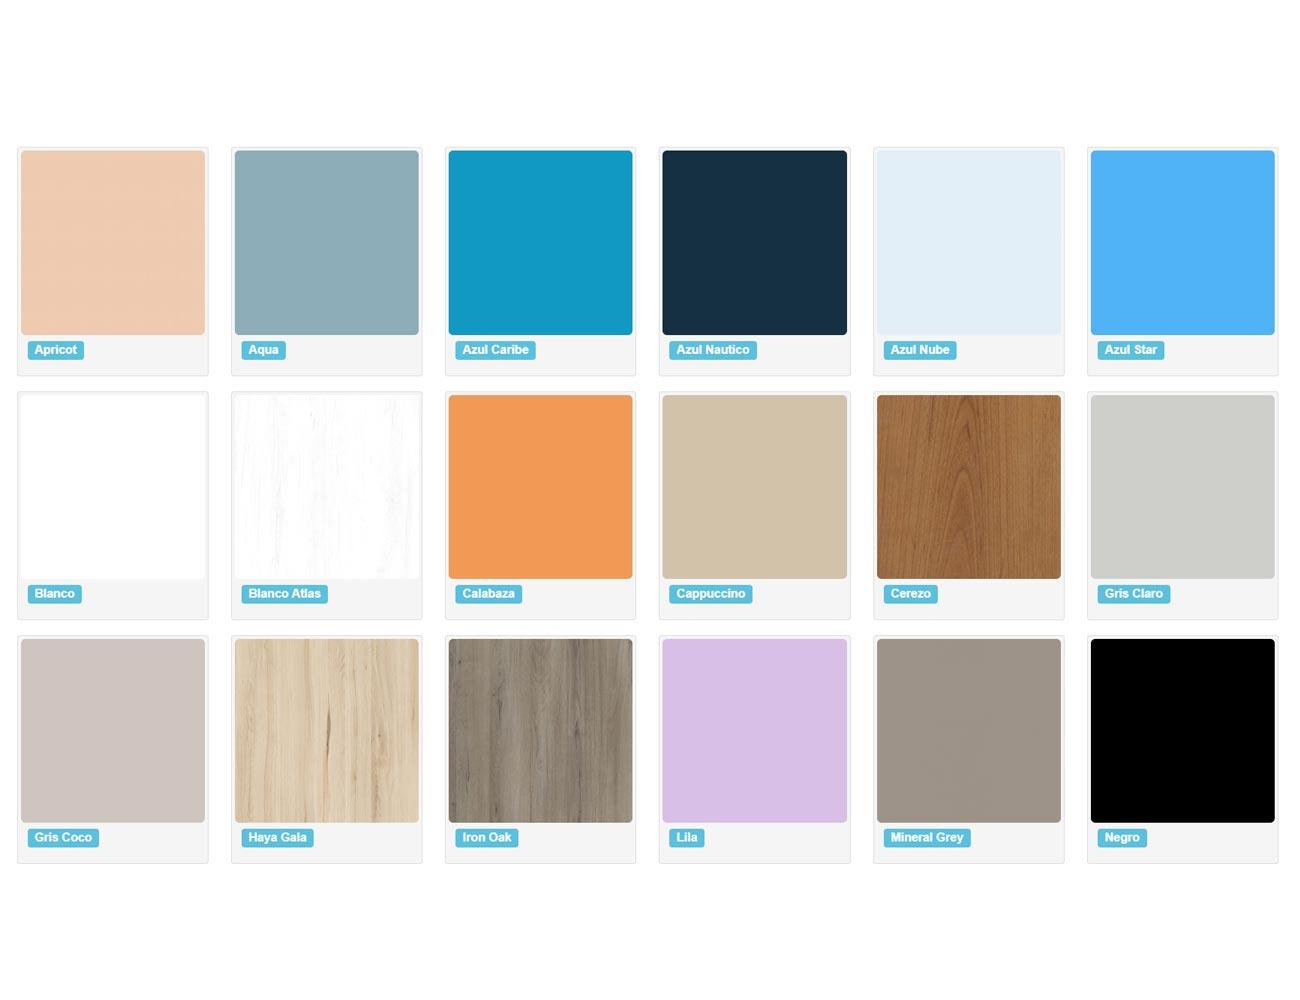 Colores217